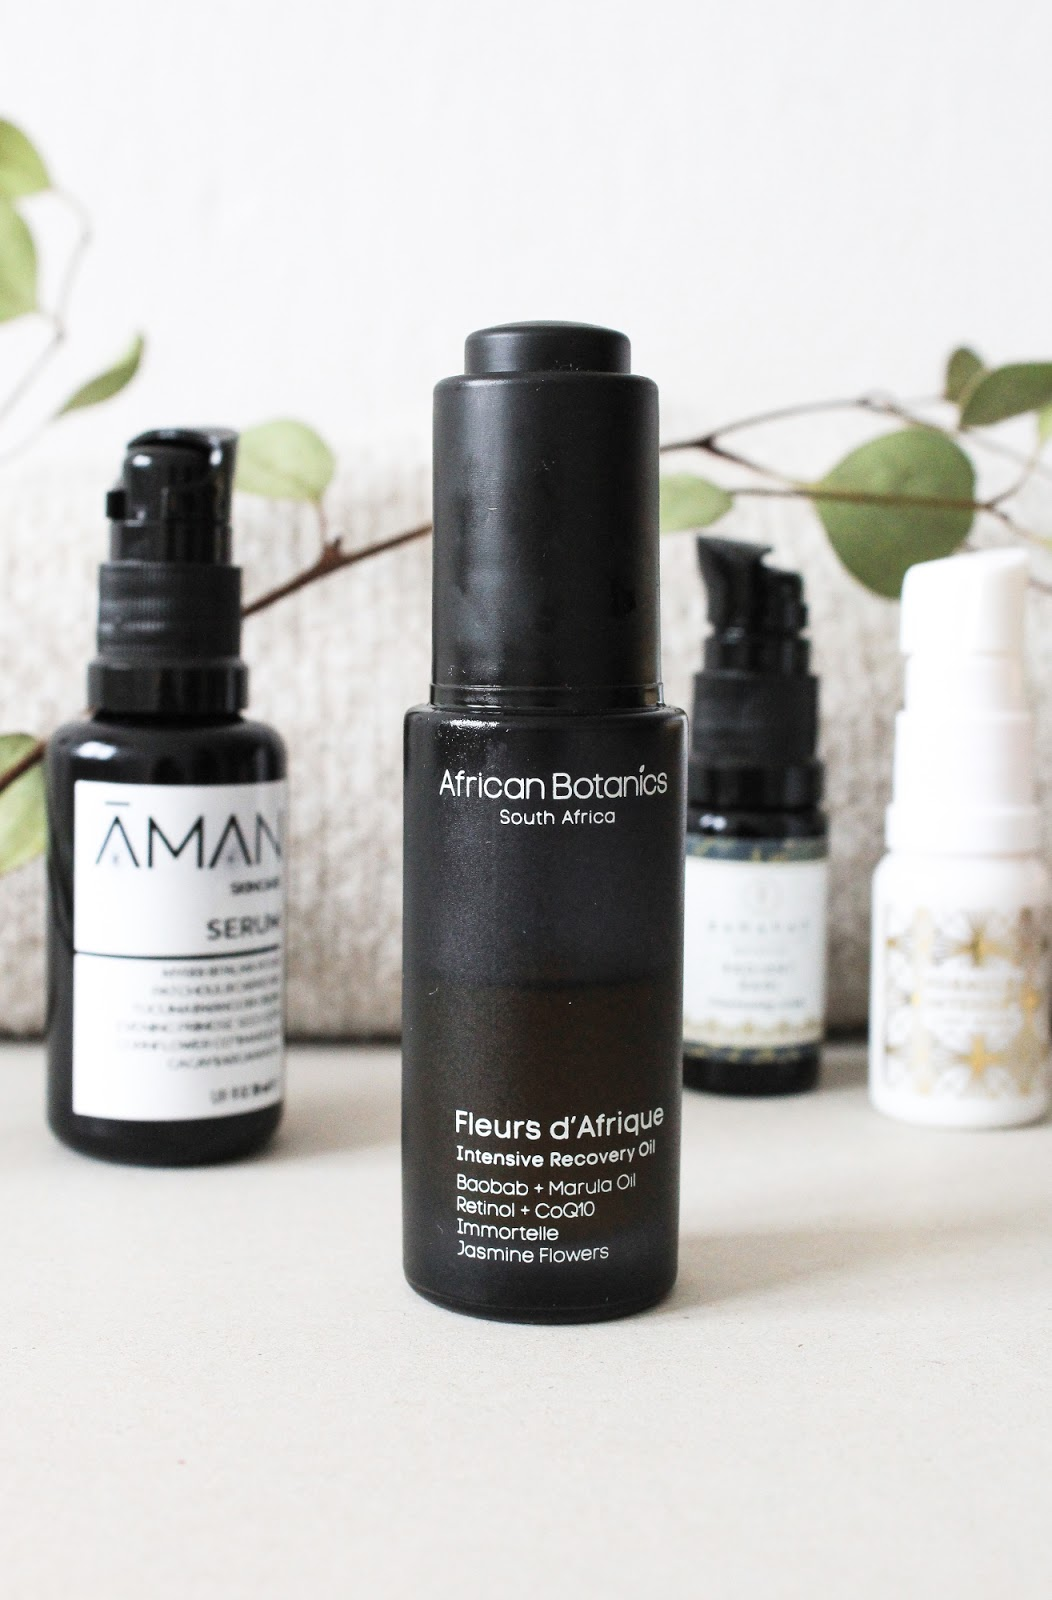 African Botanics Fleurs d'Afrique Intensive Recovery Oil Boxwalla Beauty Box